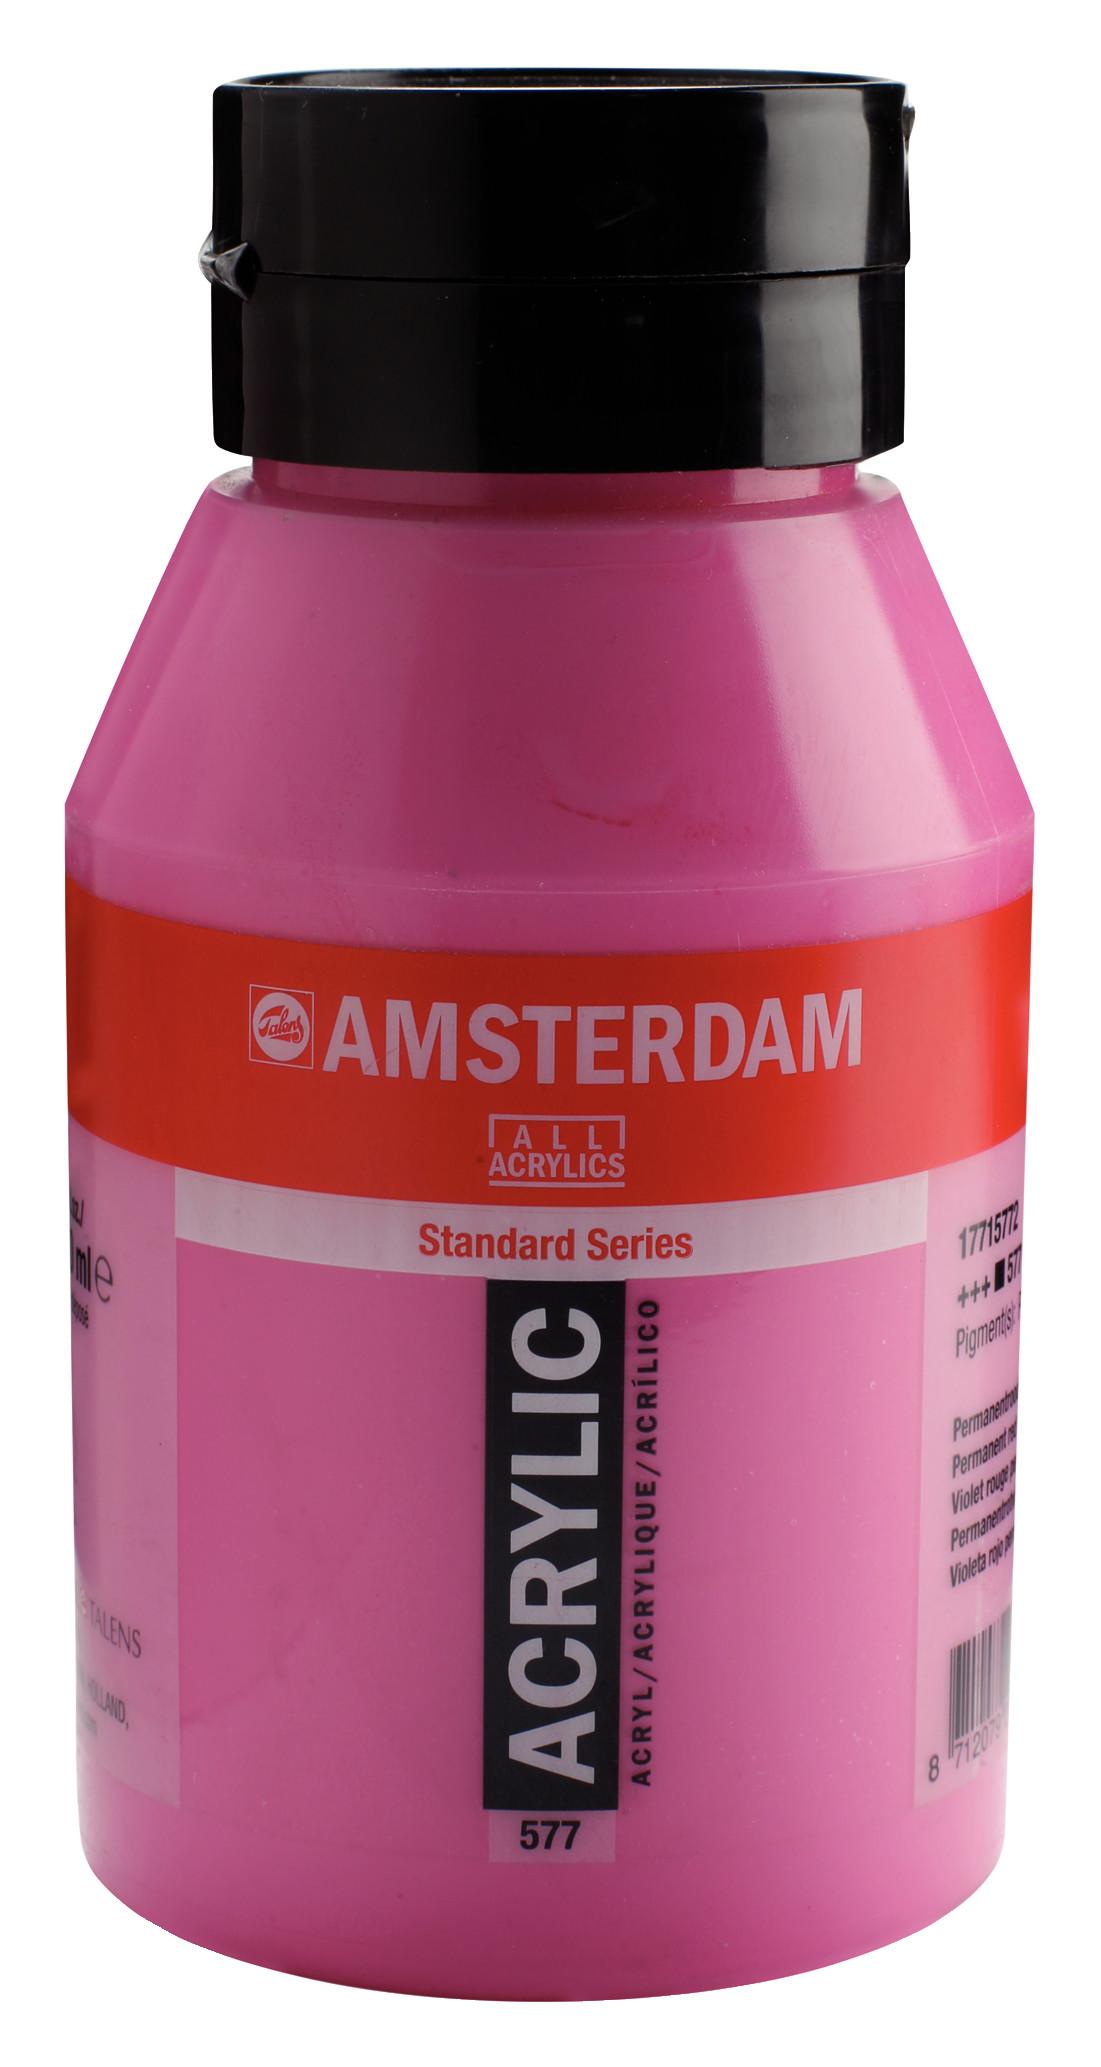 Amsterdam Standard Series Acrylic Jar 1000 ml Permanent red violet light 577